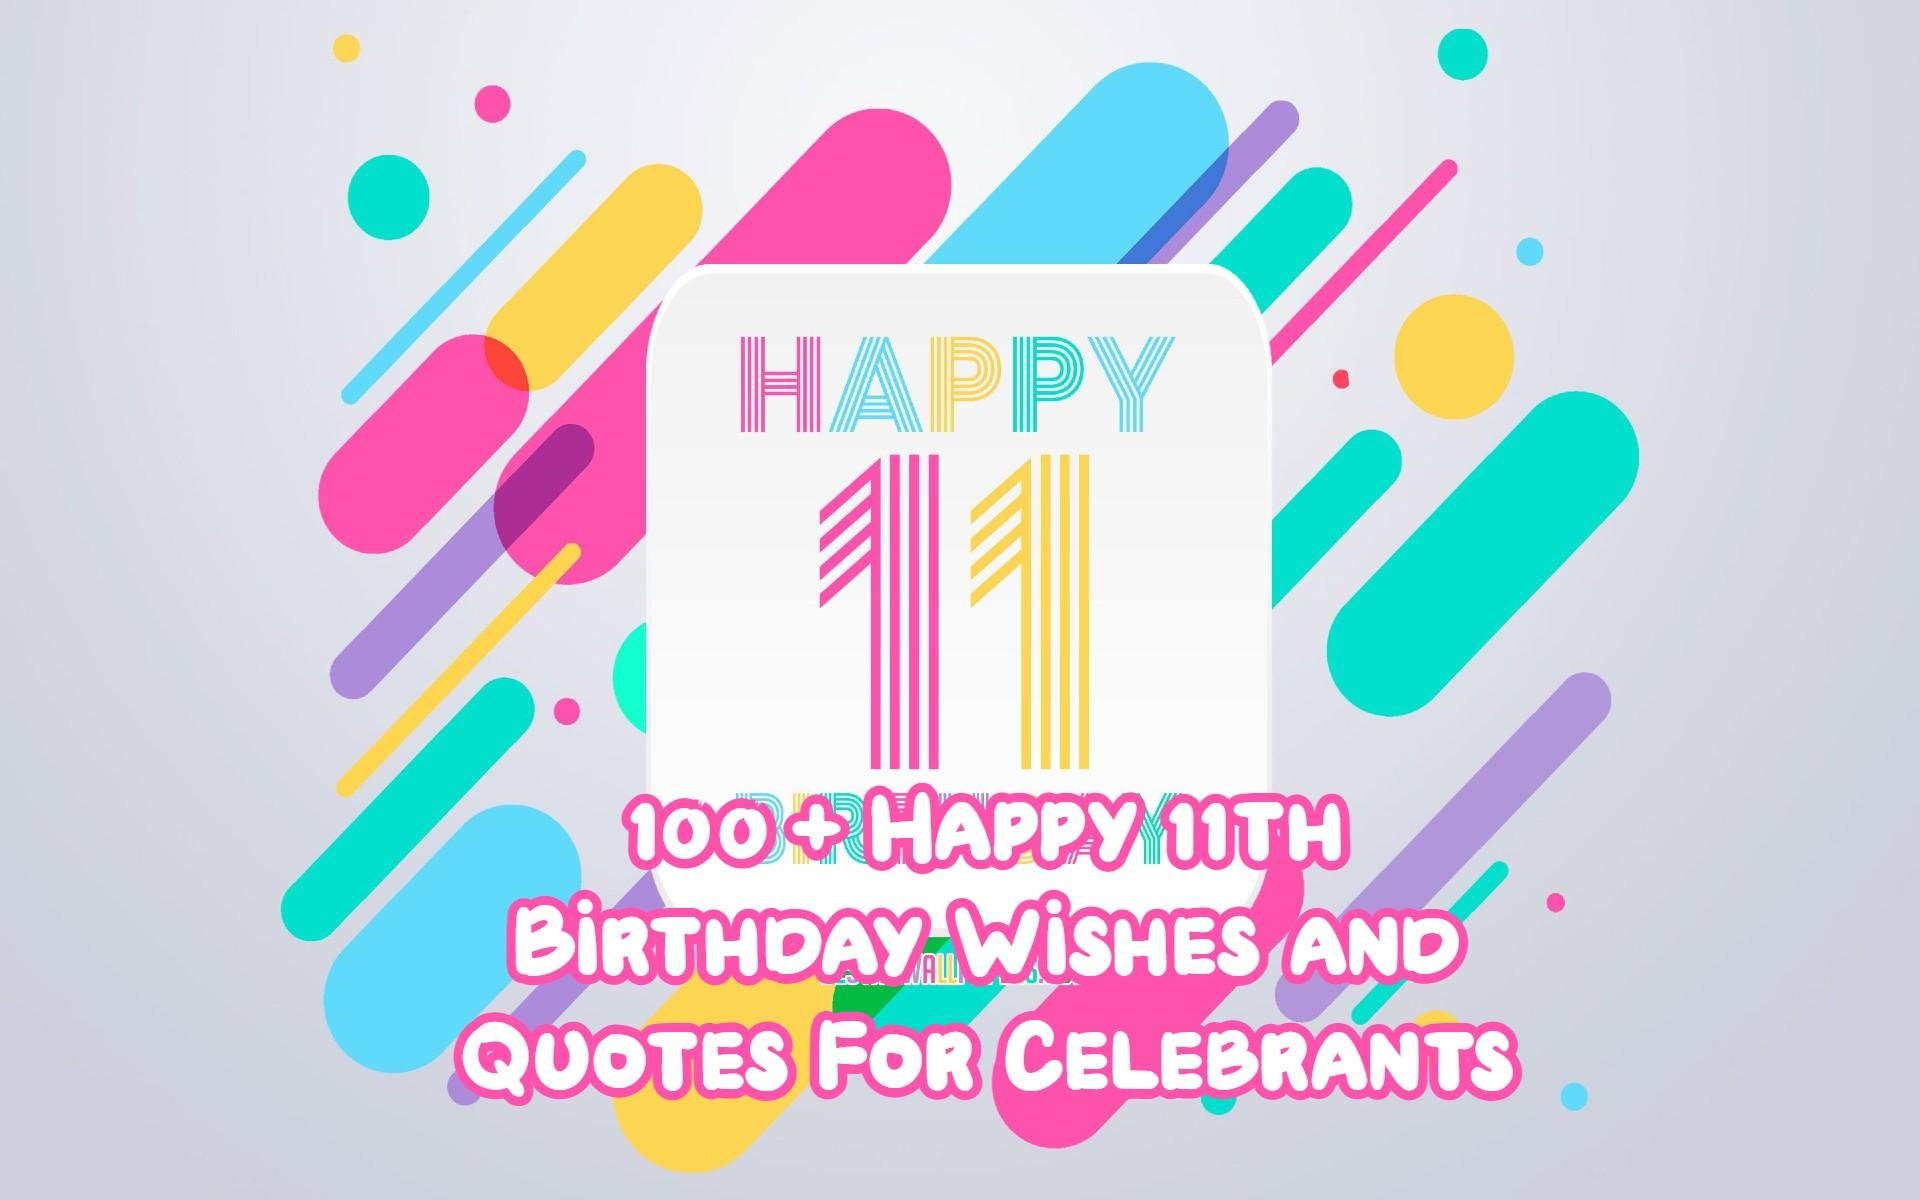 Happy 11th Birthday